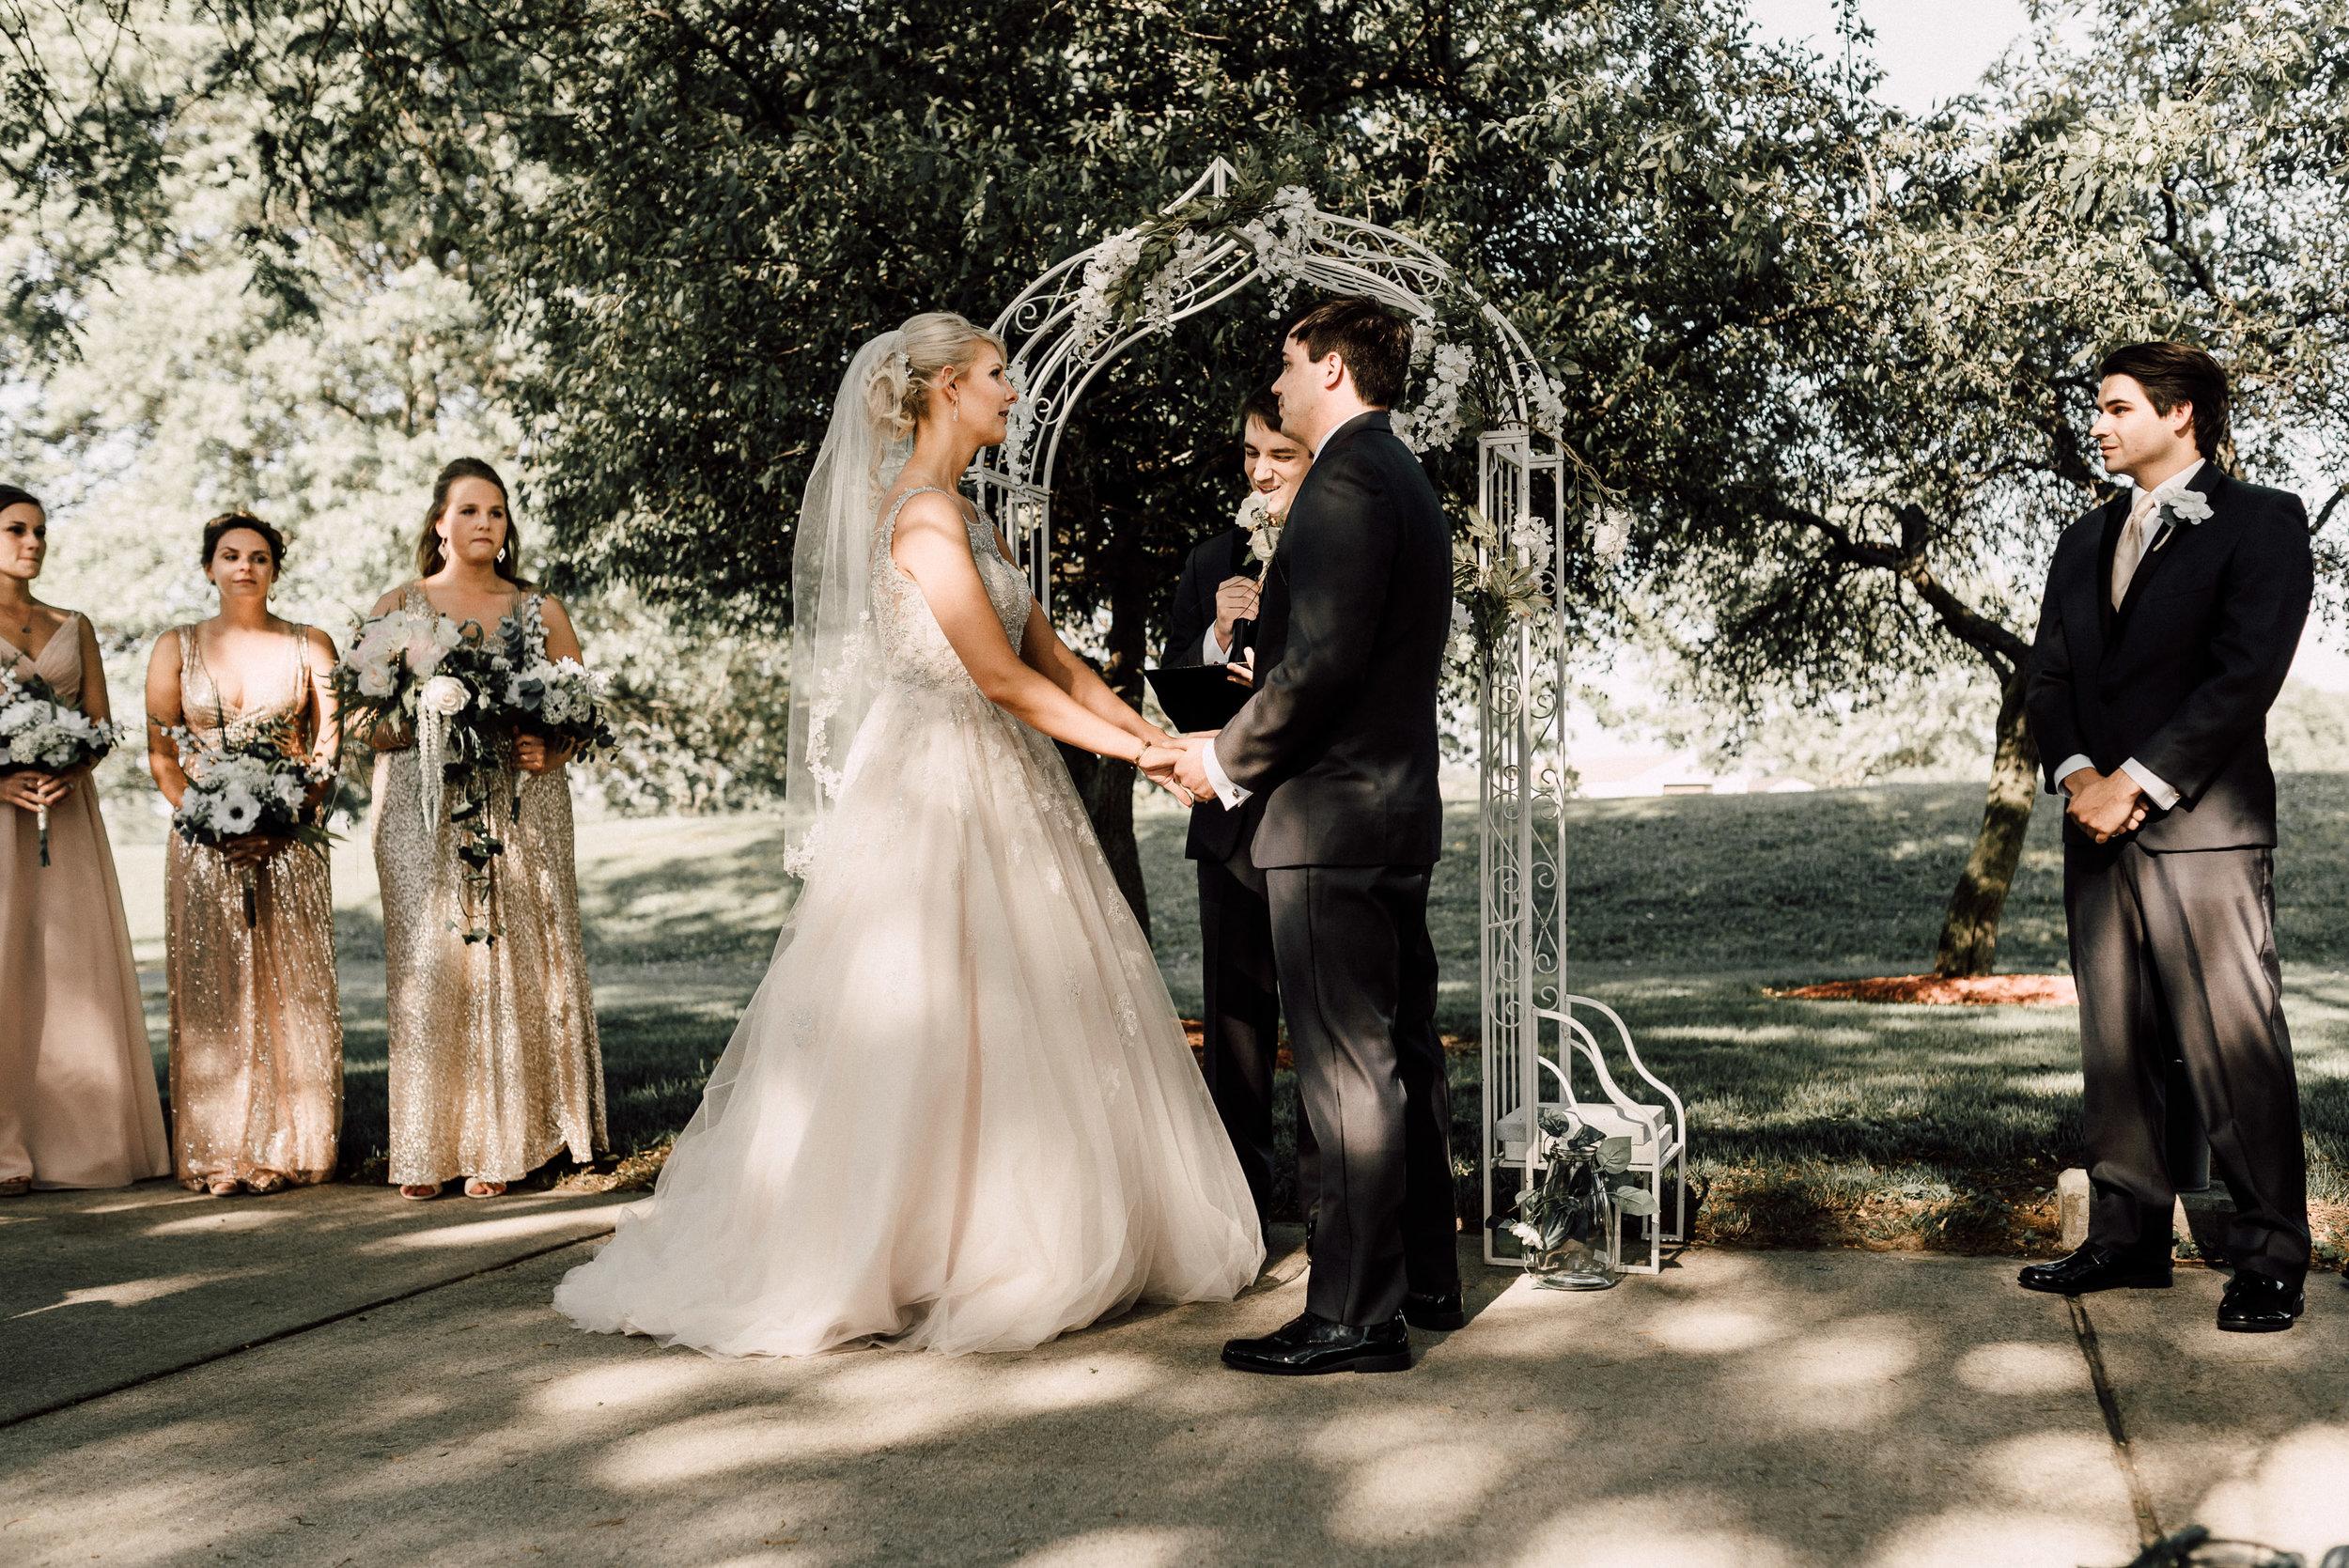 wedding ceremony moments, wedding ceremony decoration ideas, pinterest wedding ideas